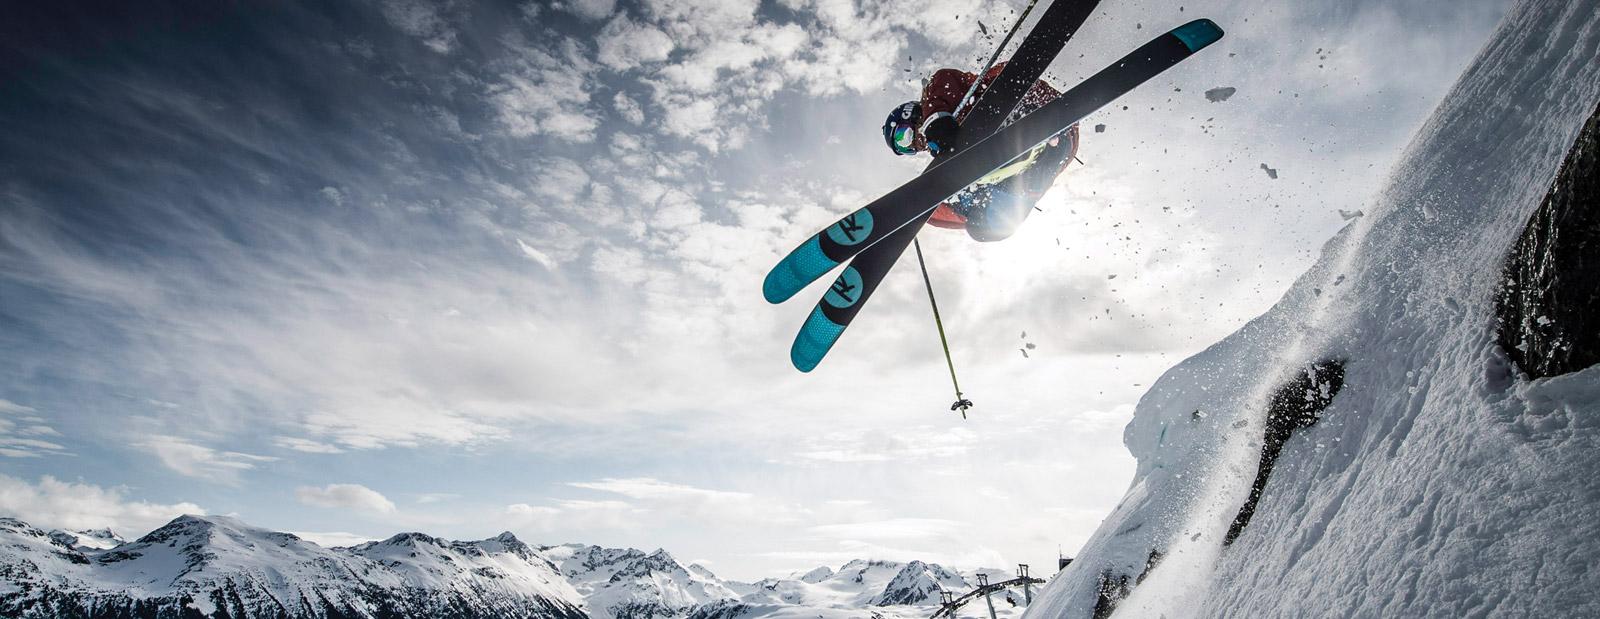 comment payer moins cher en mati re d 39 achat ski en ligne. Black Bedroom Furniture Sets. Home Design Ideas